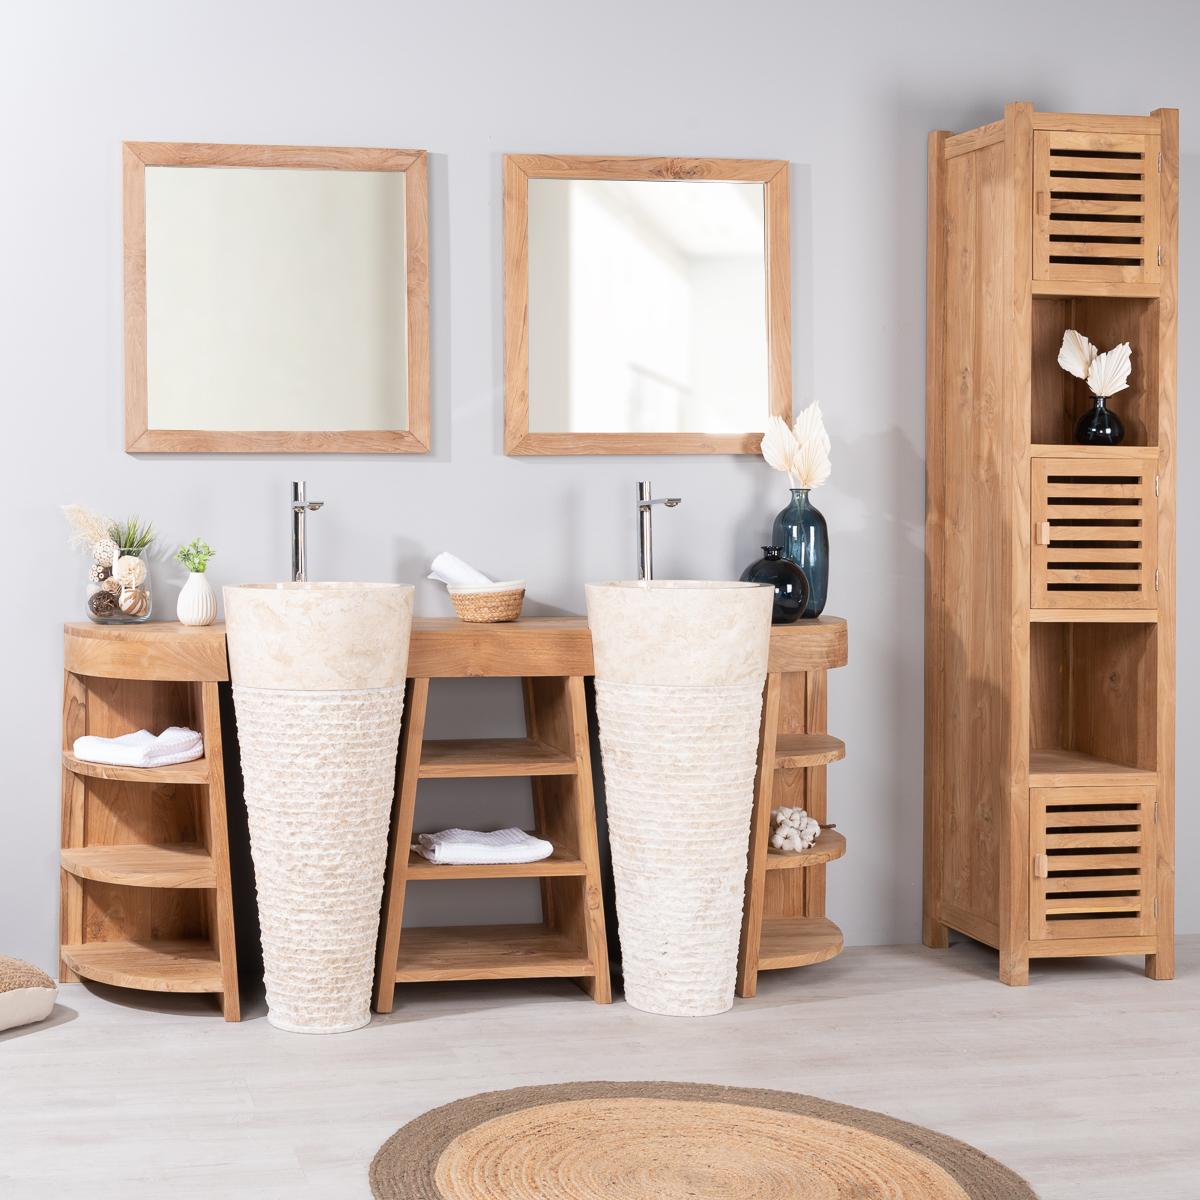 Mueble de ba o de teca florencia doble 180cm lavabos crema for Mueble de bano doble lavabo de madera